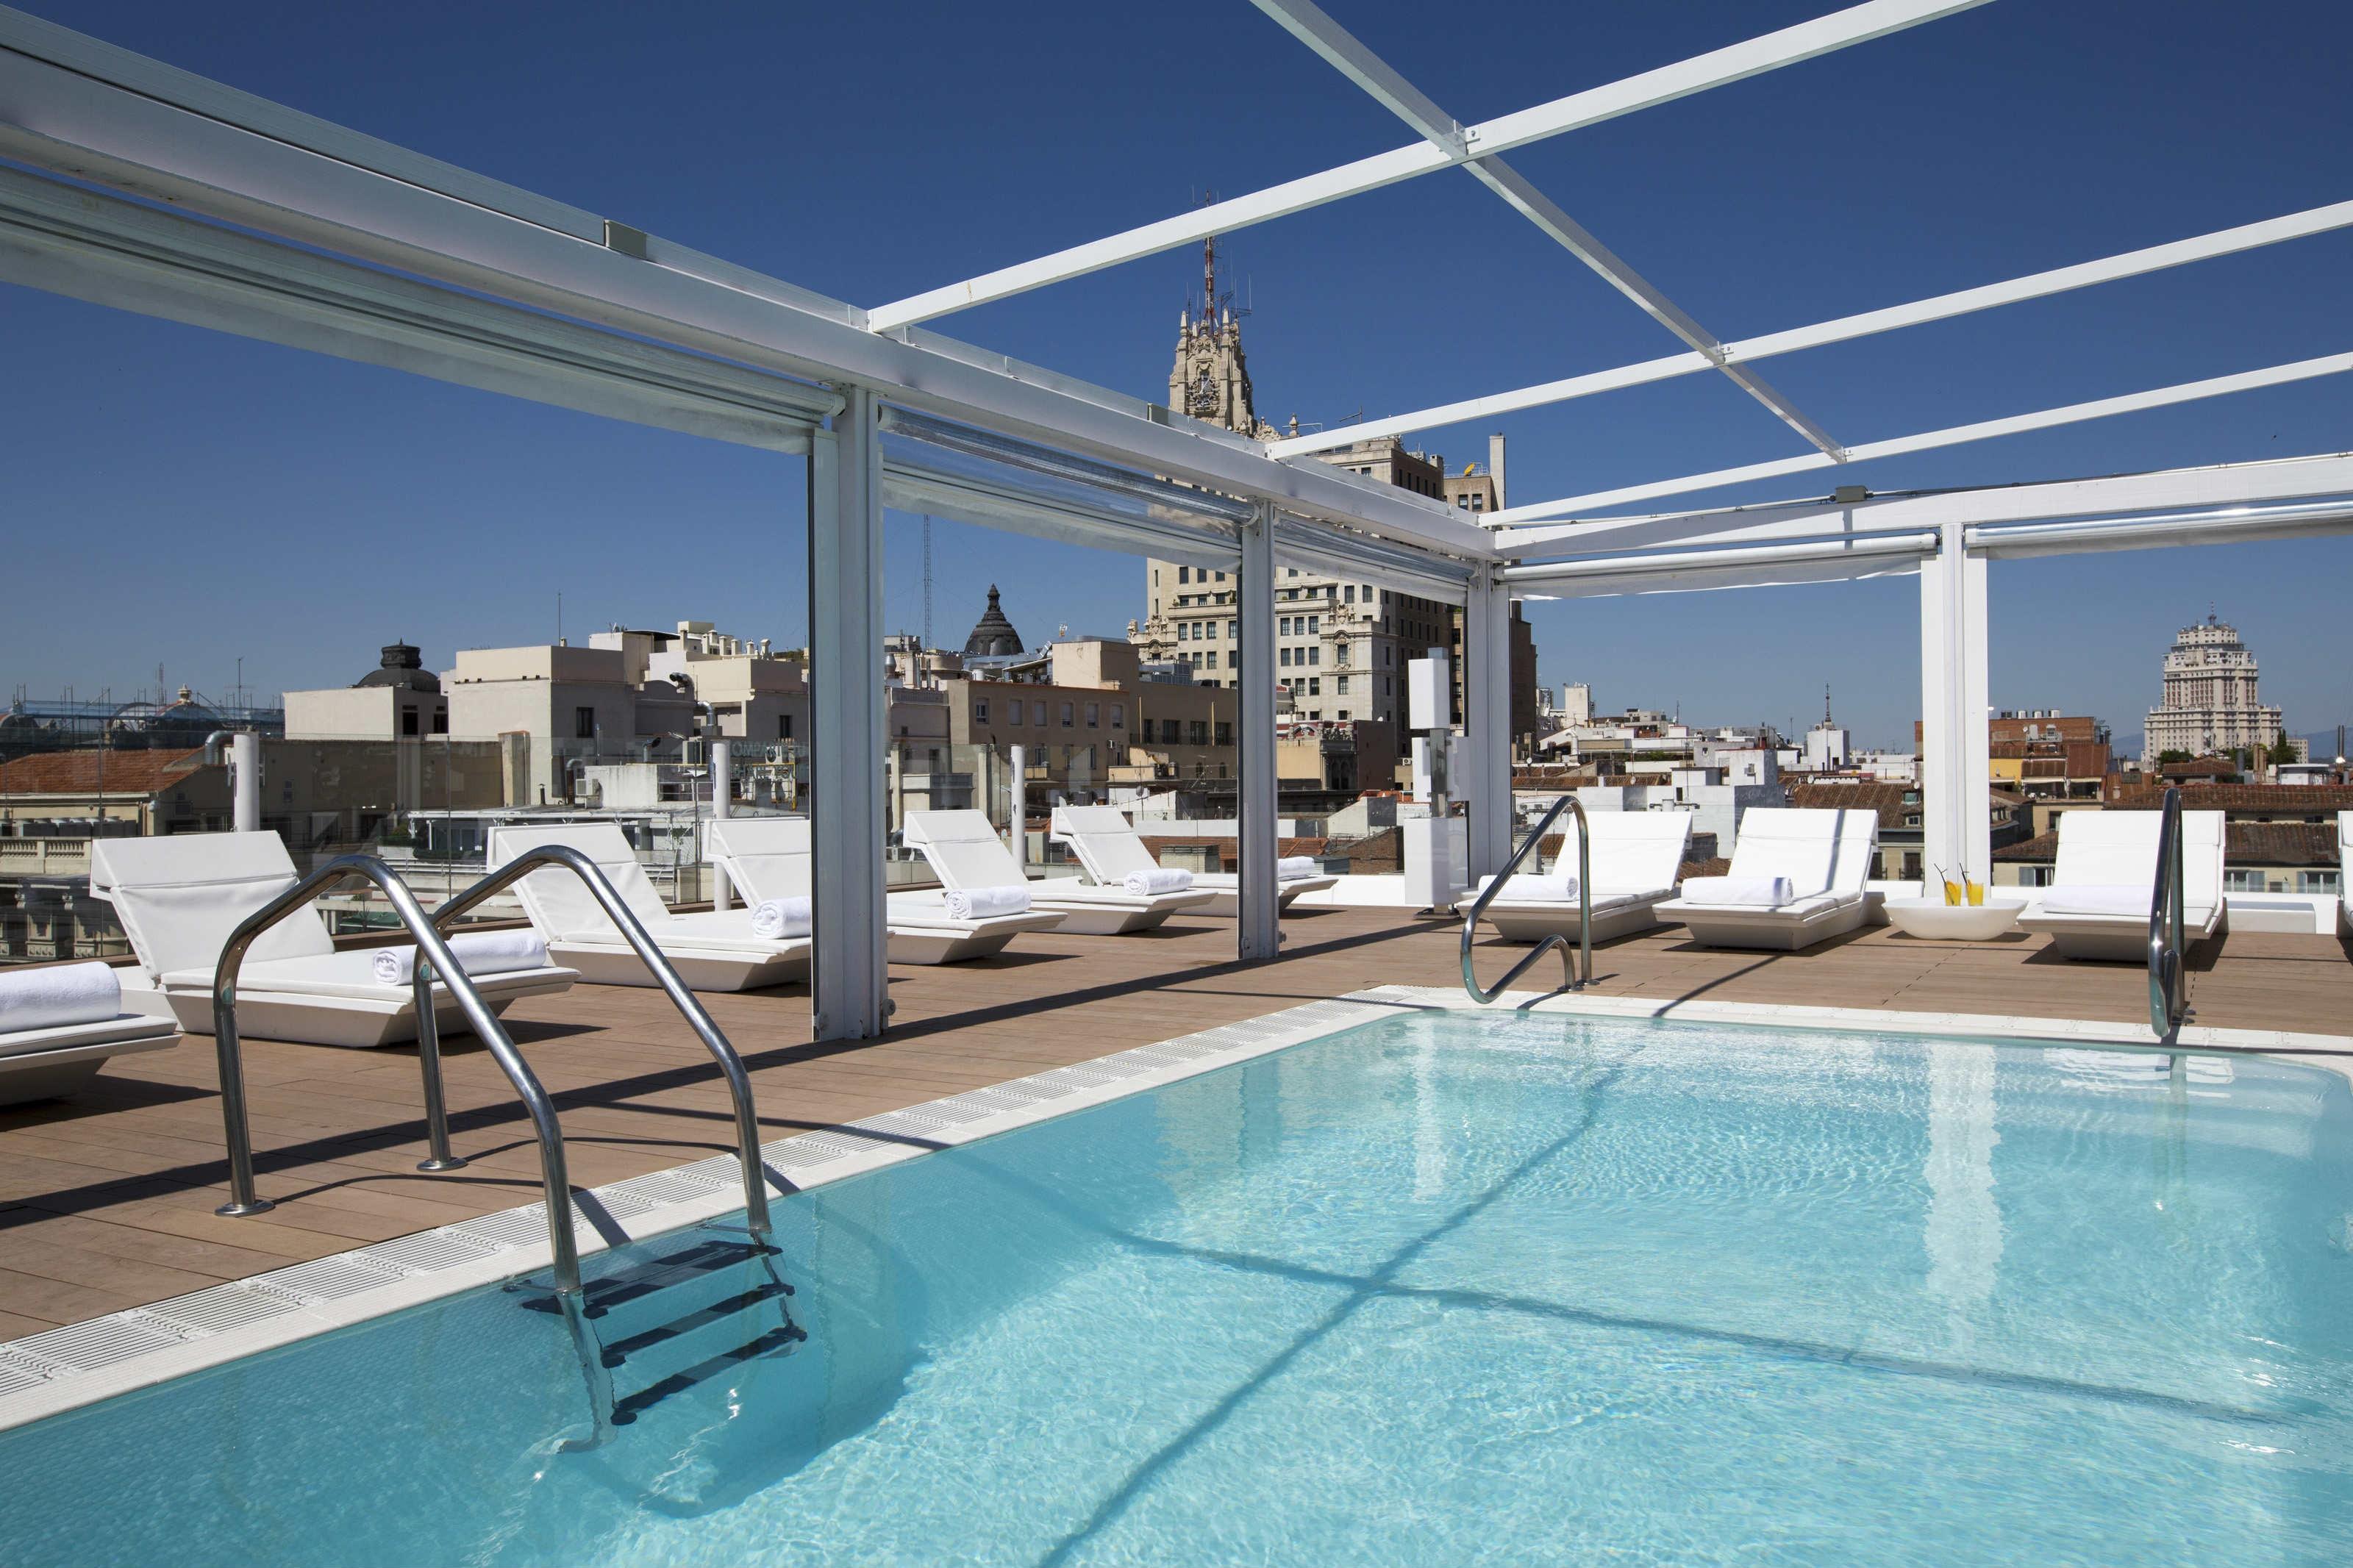 Room Mate Oscar's rooftop pool